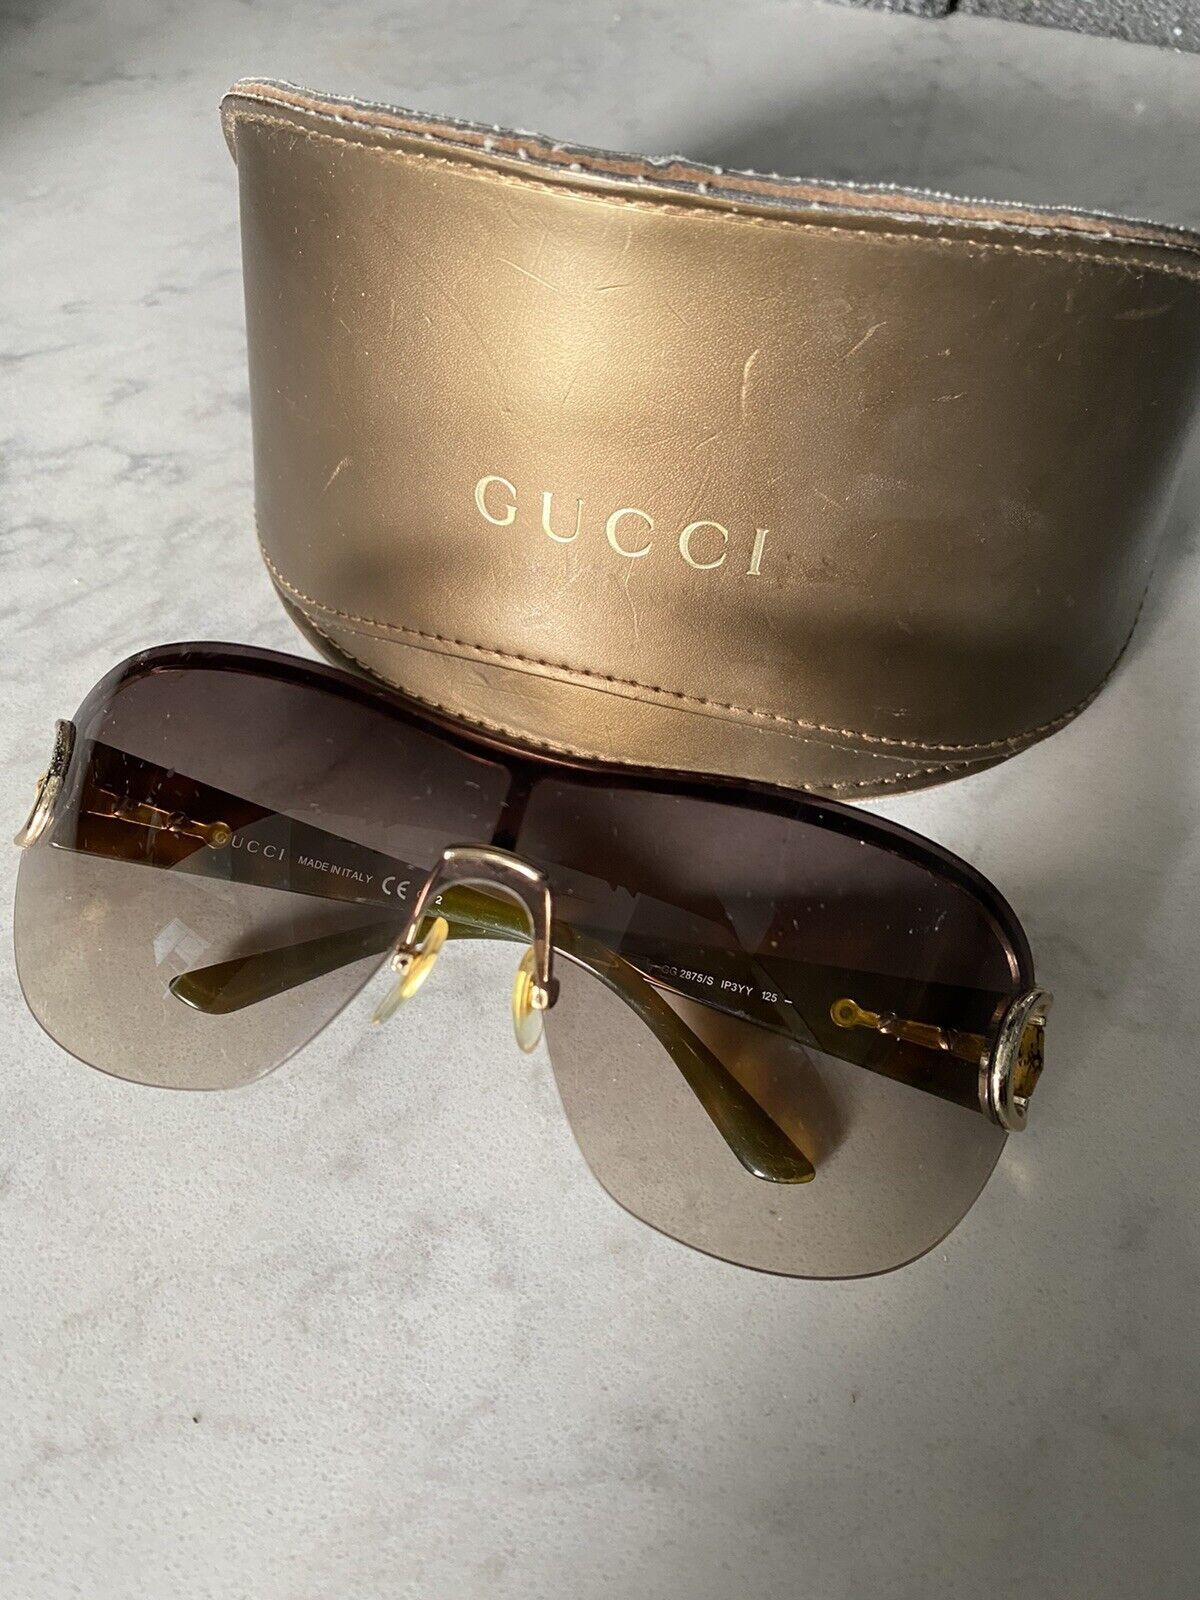 Gucci Bamboo Sunglasses - image 1